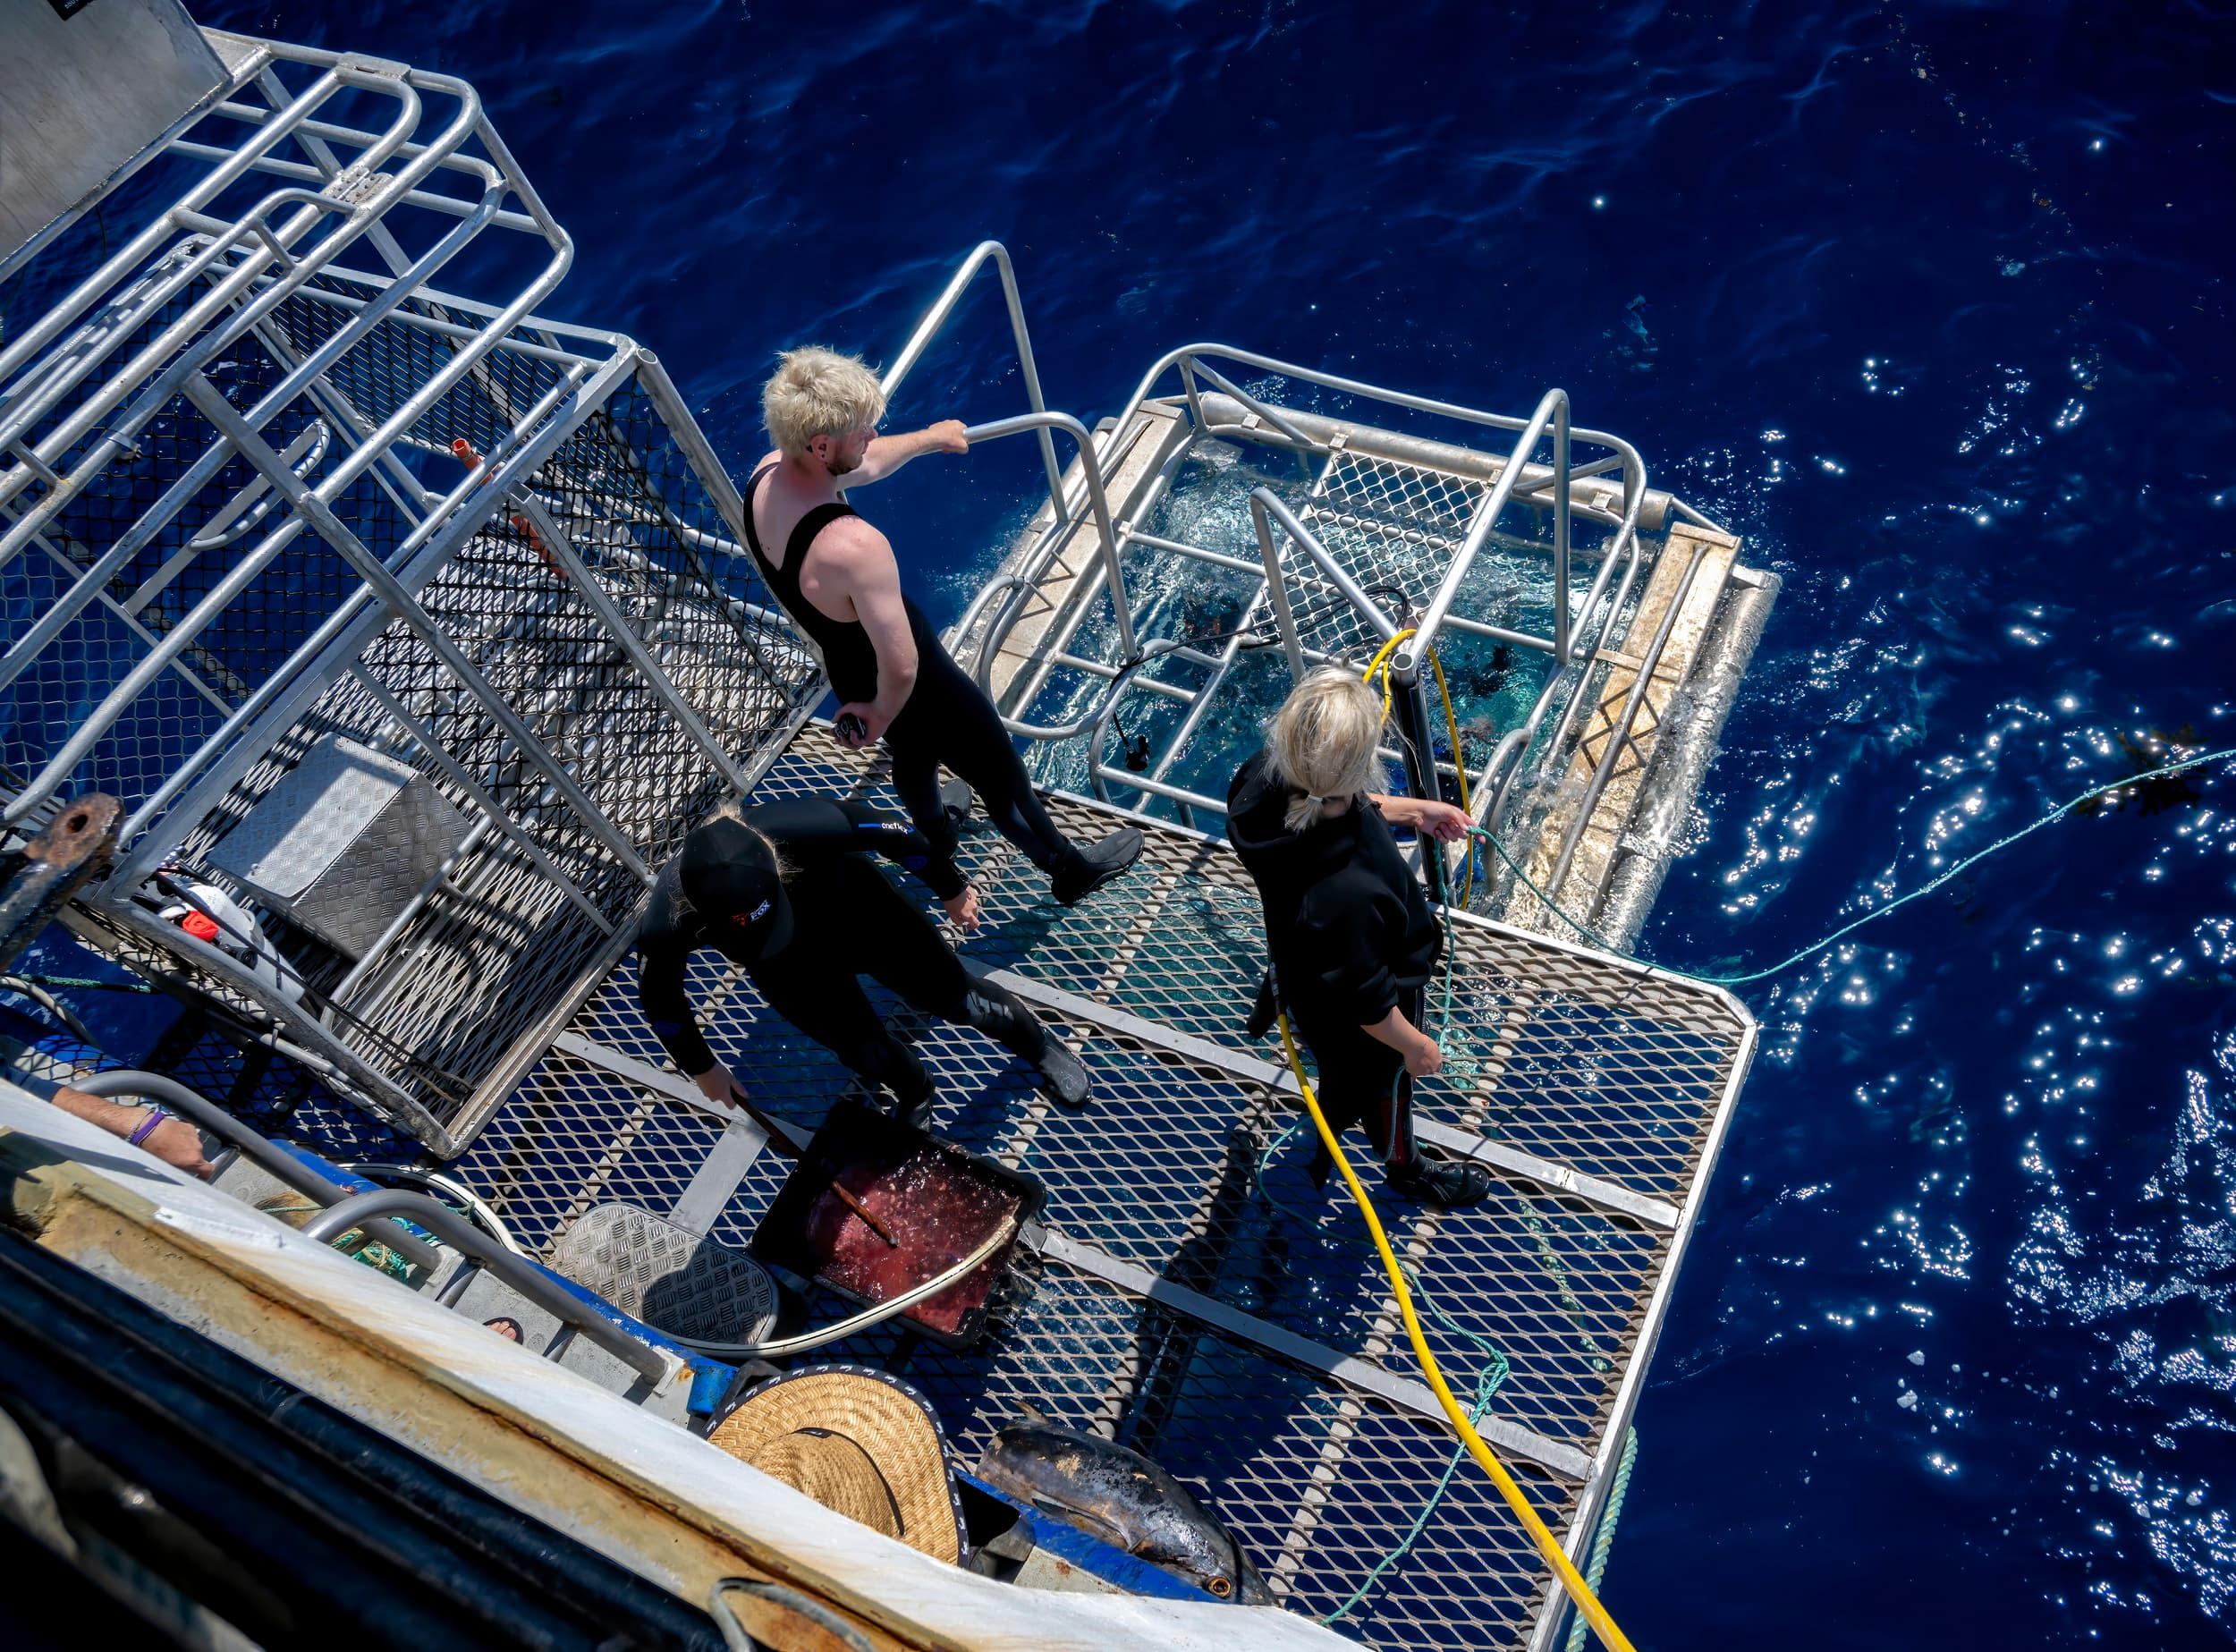 Crew cage duty